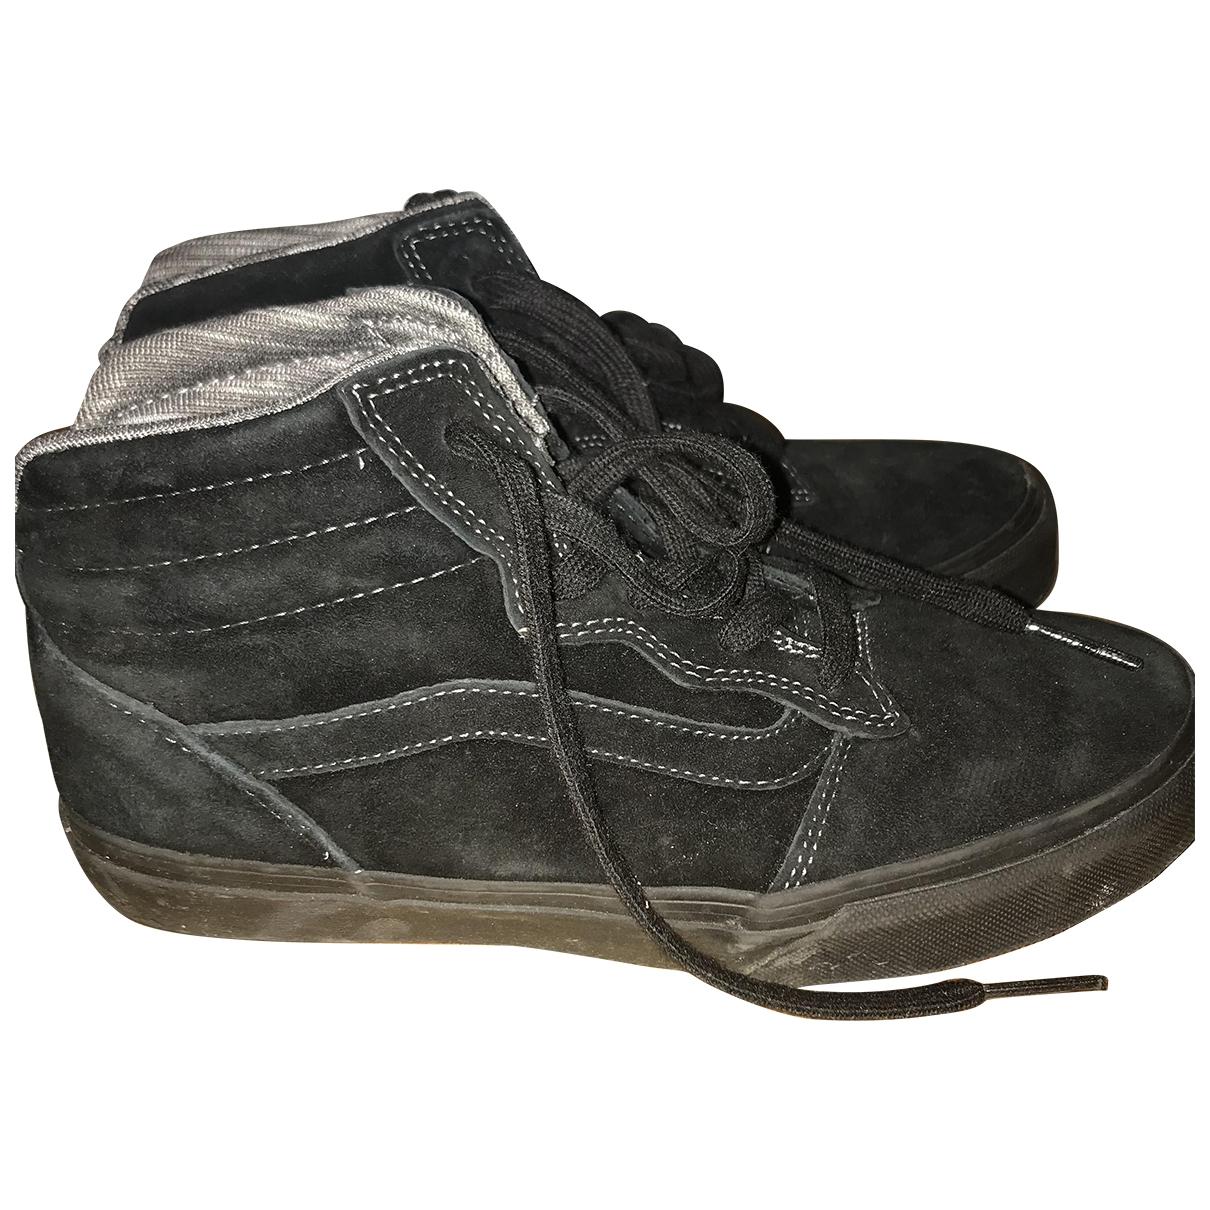 Vans \N Black Suede Trainers for Women 37.5 EU